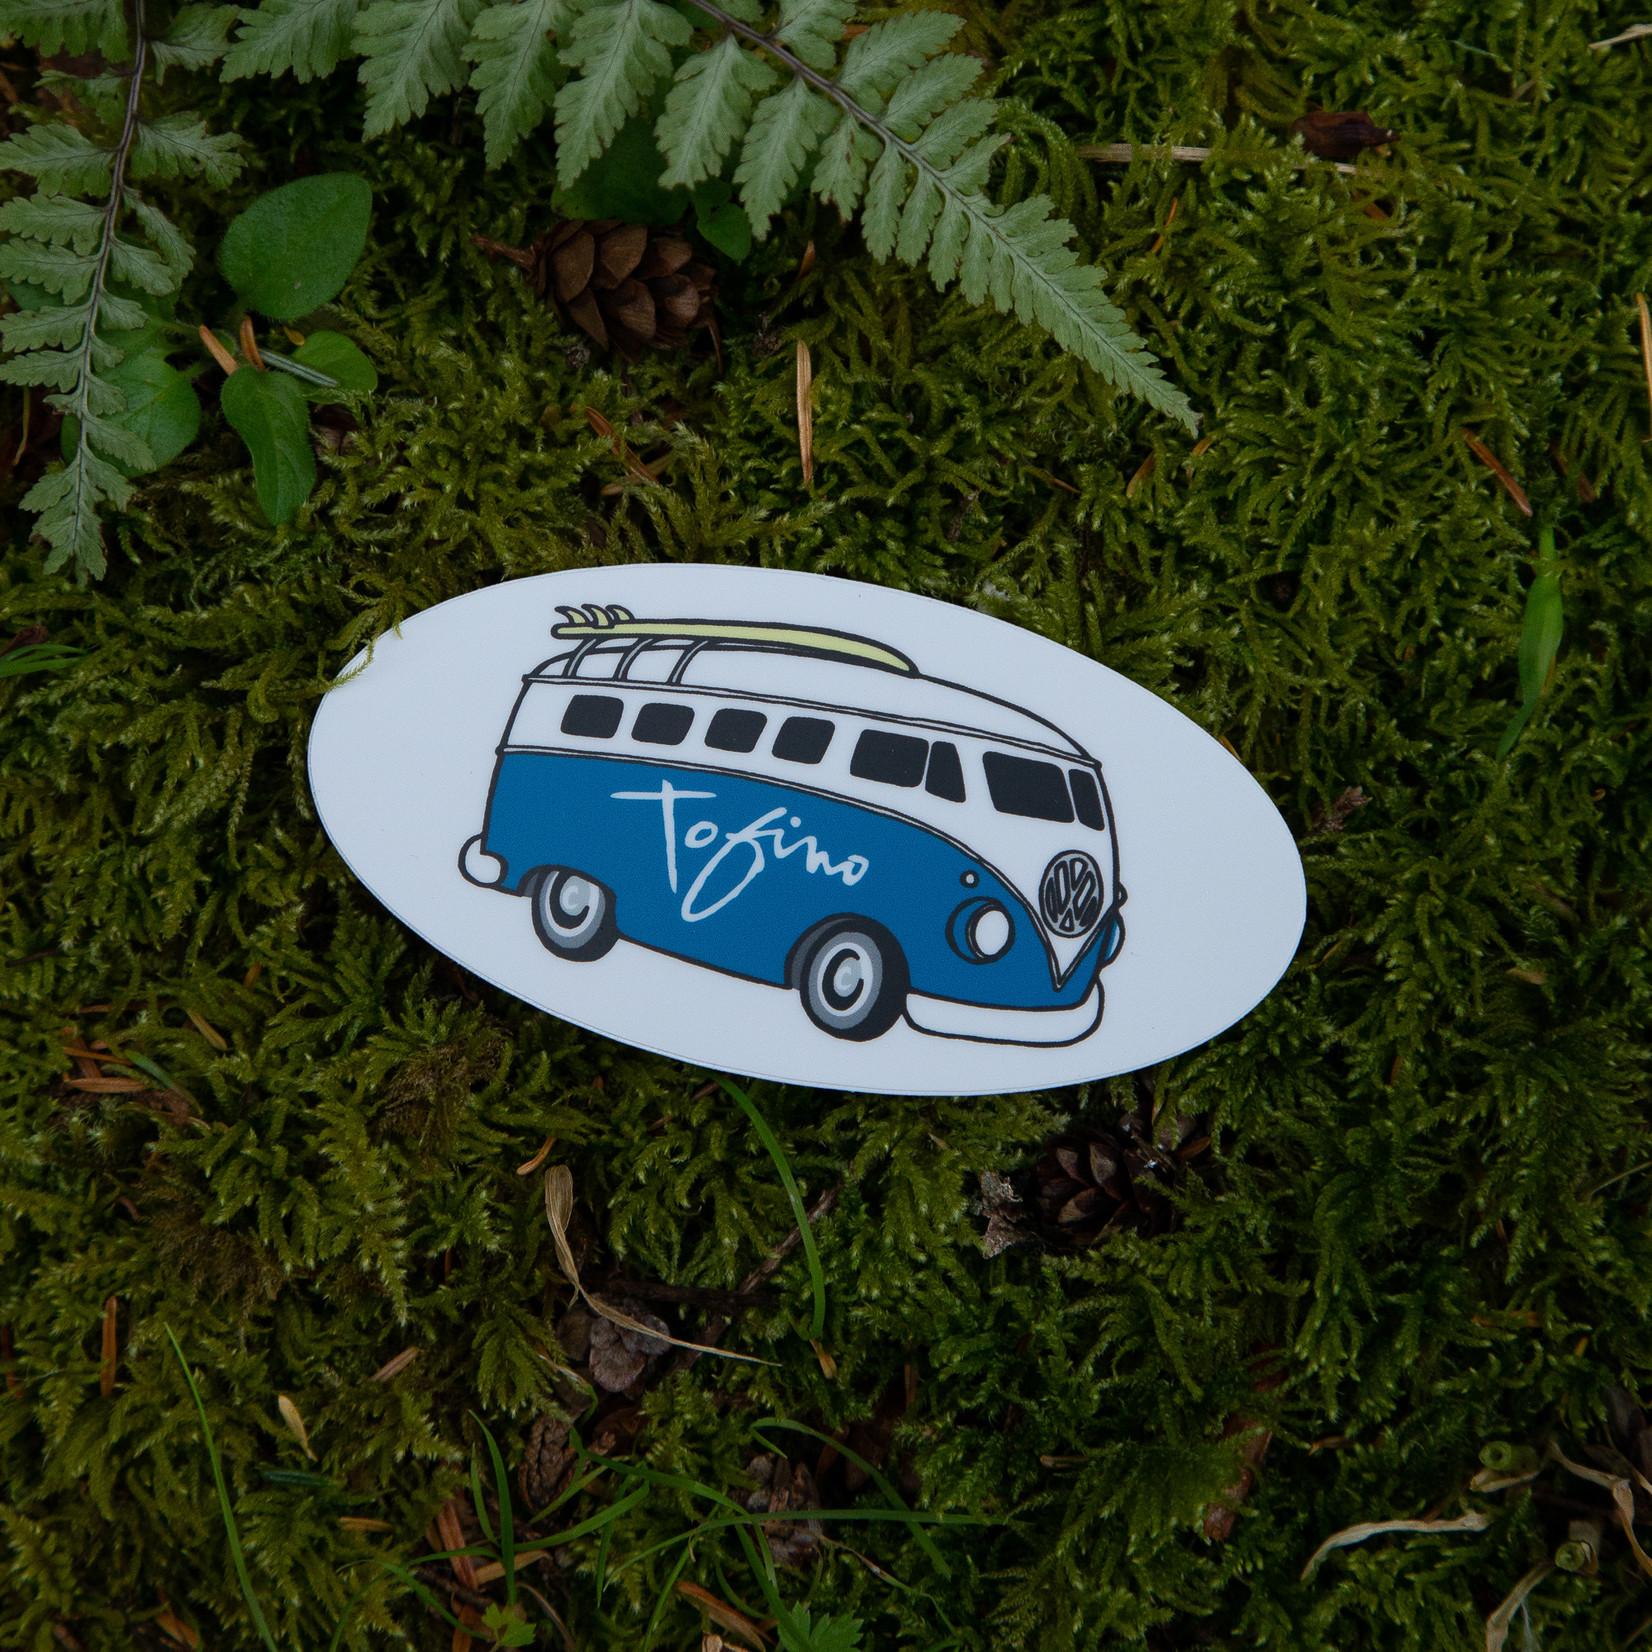 Tourism Tofino Sticker Chestervan